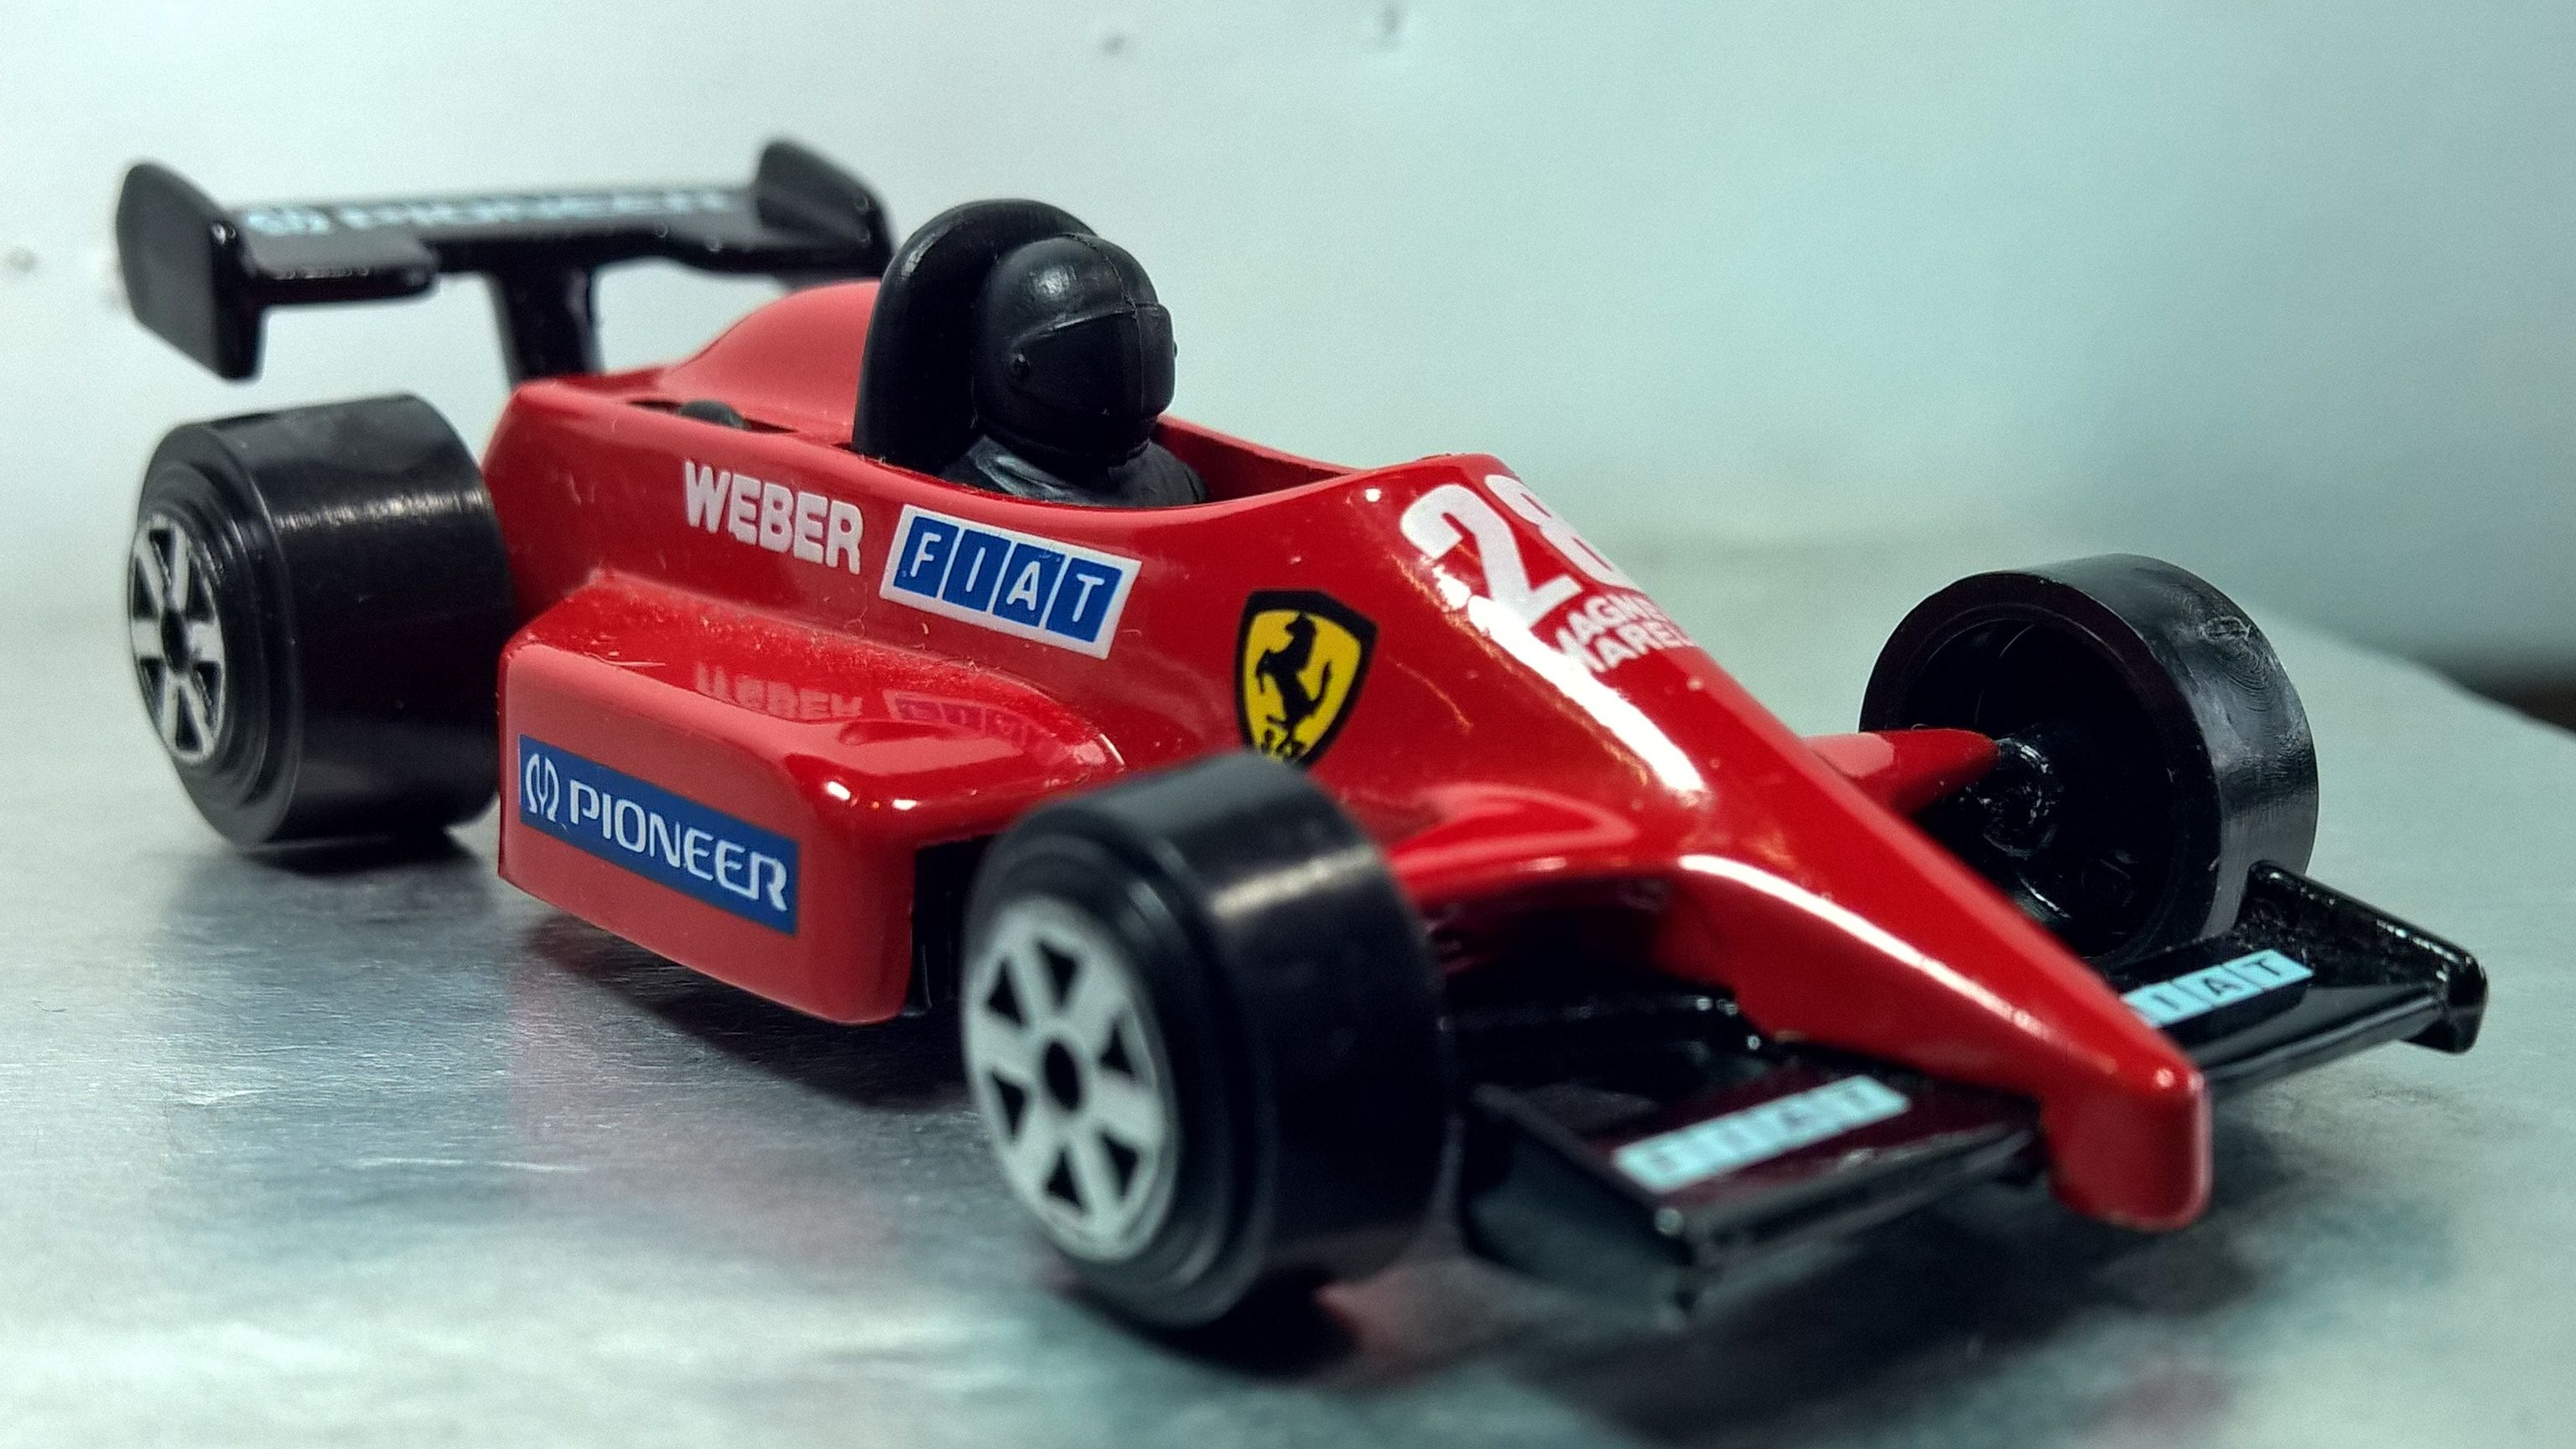 Hot wheels f1 race car autocity international only